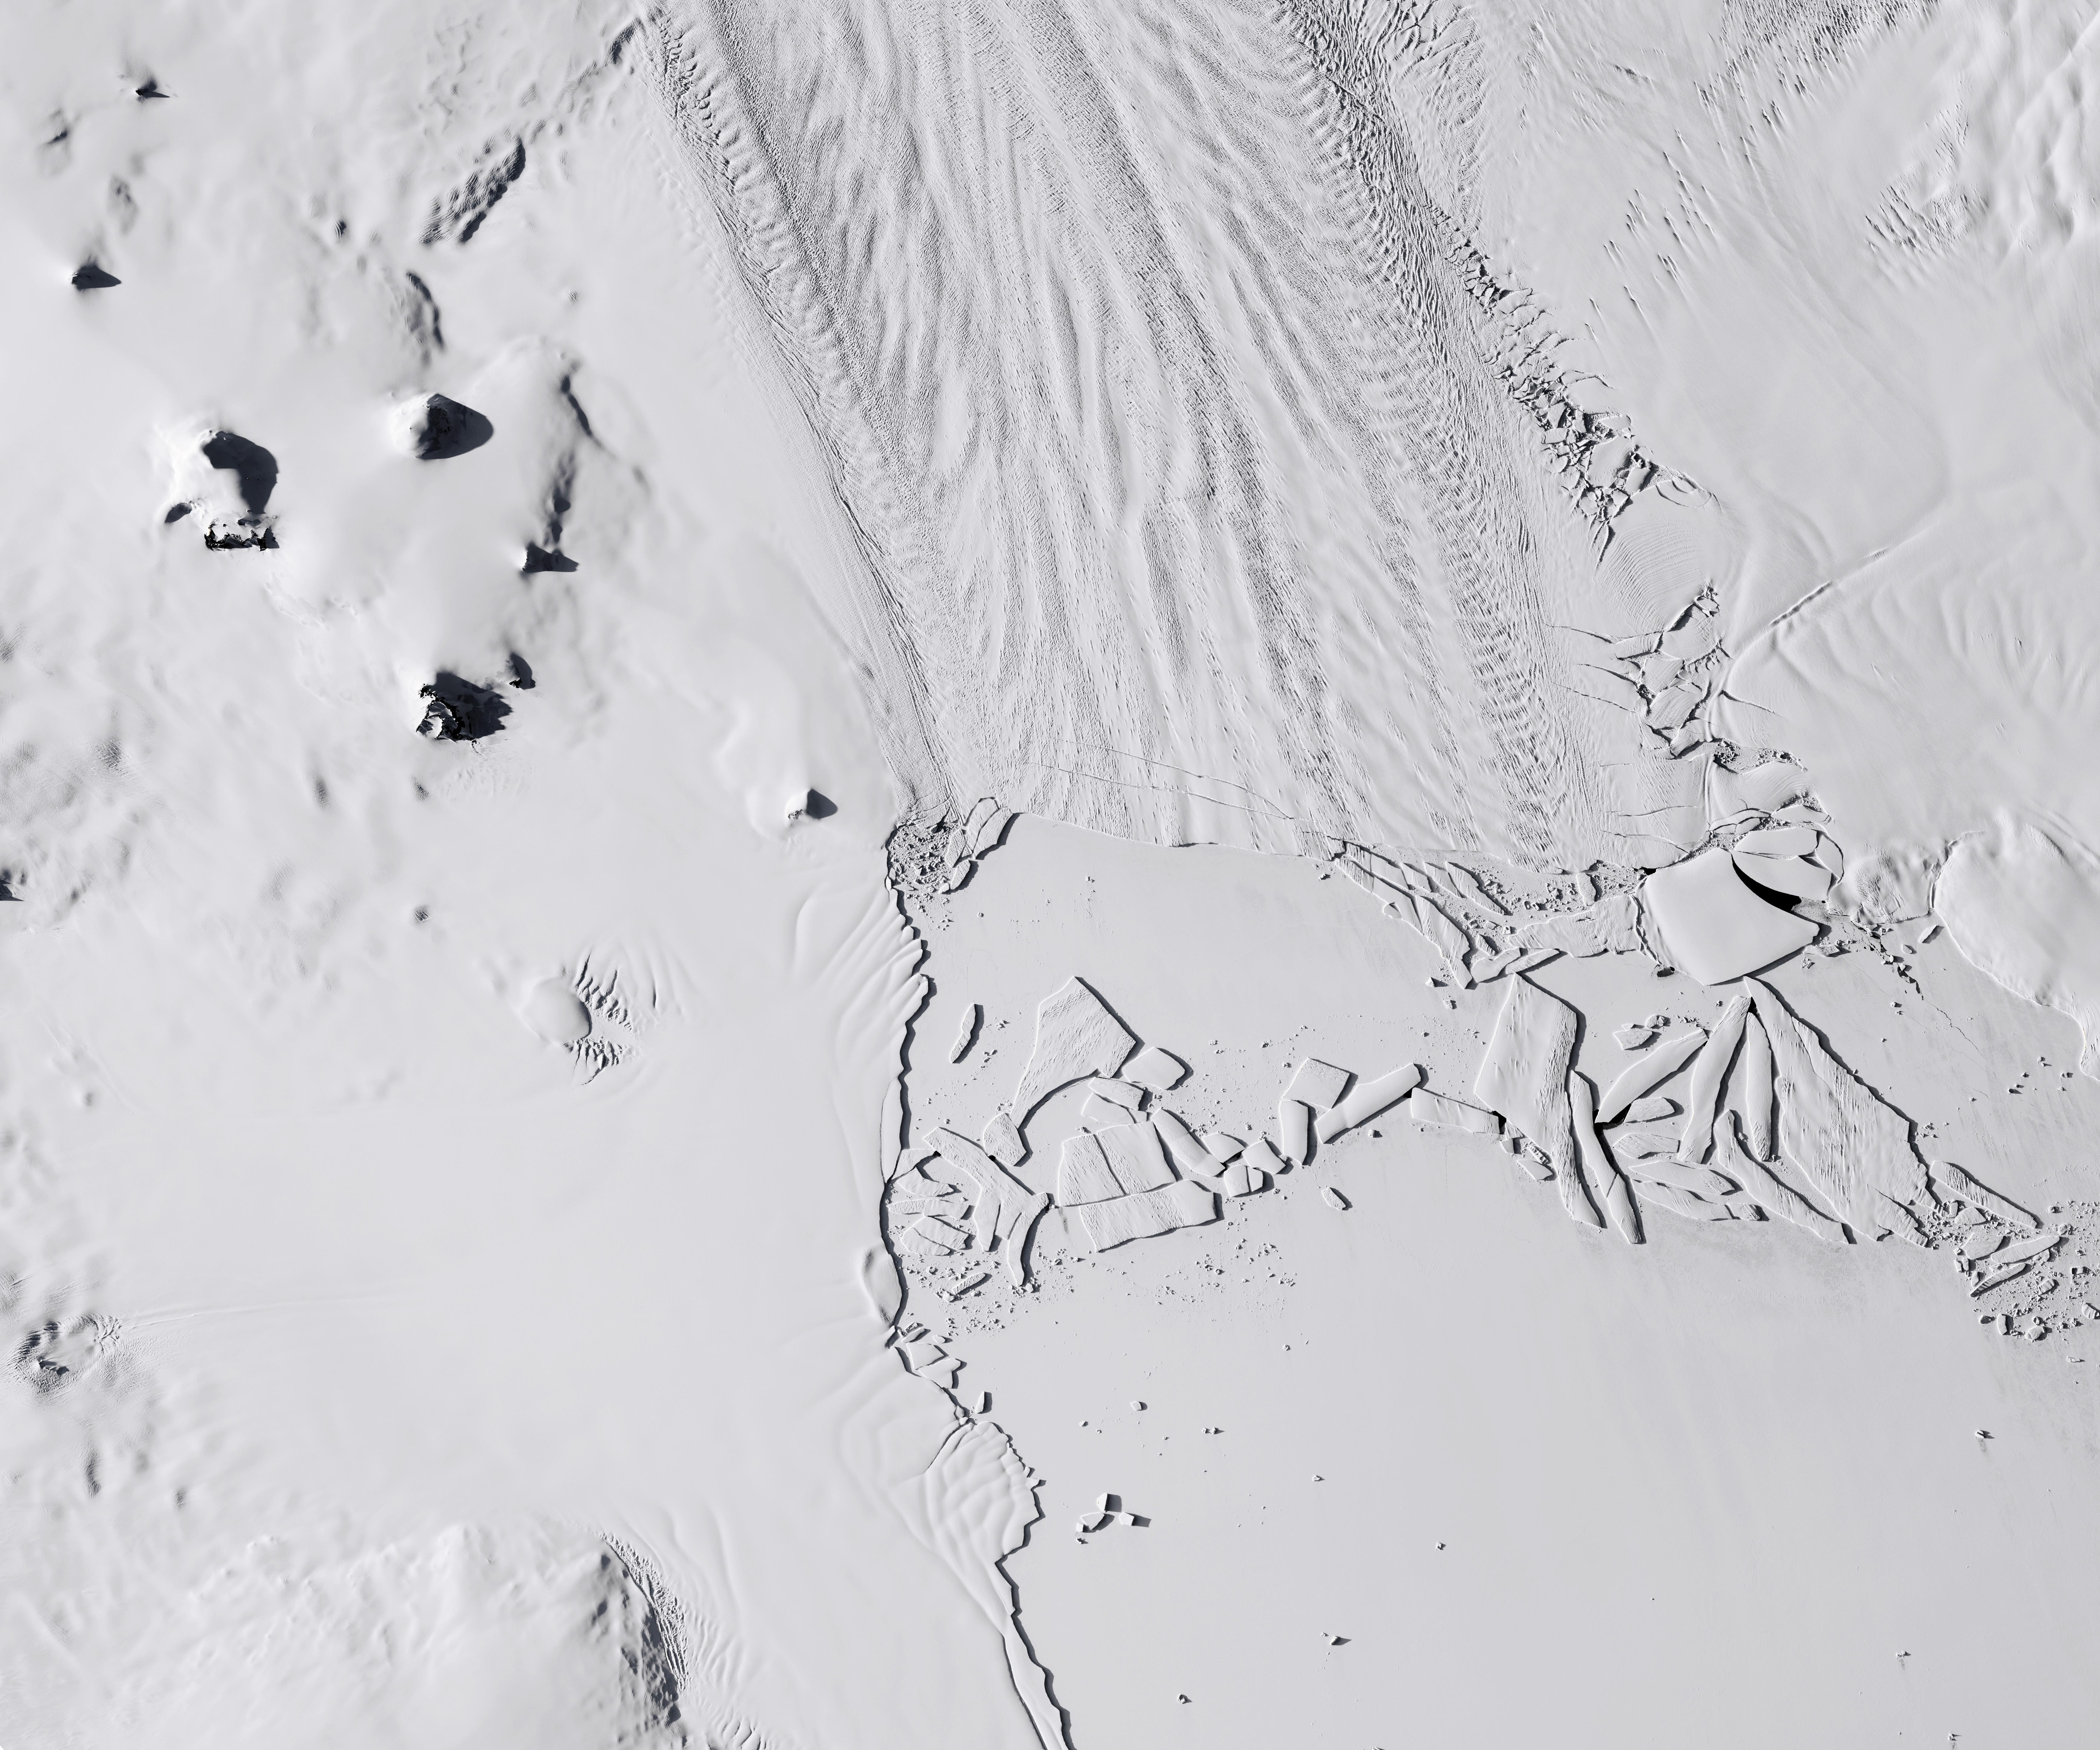 Pine Island Glacier before calving iceberg